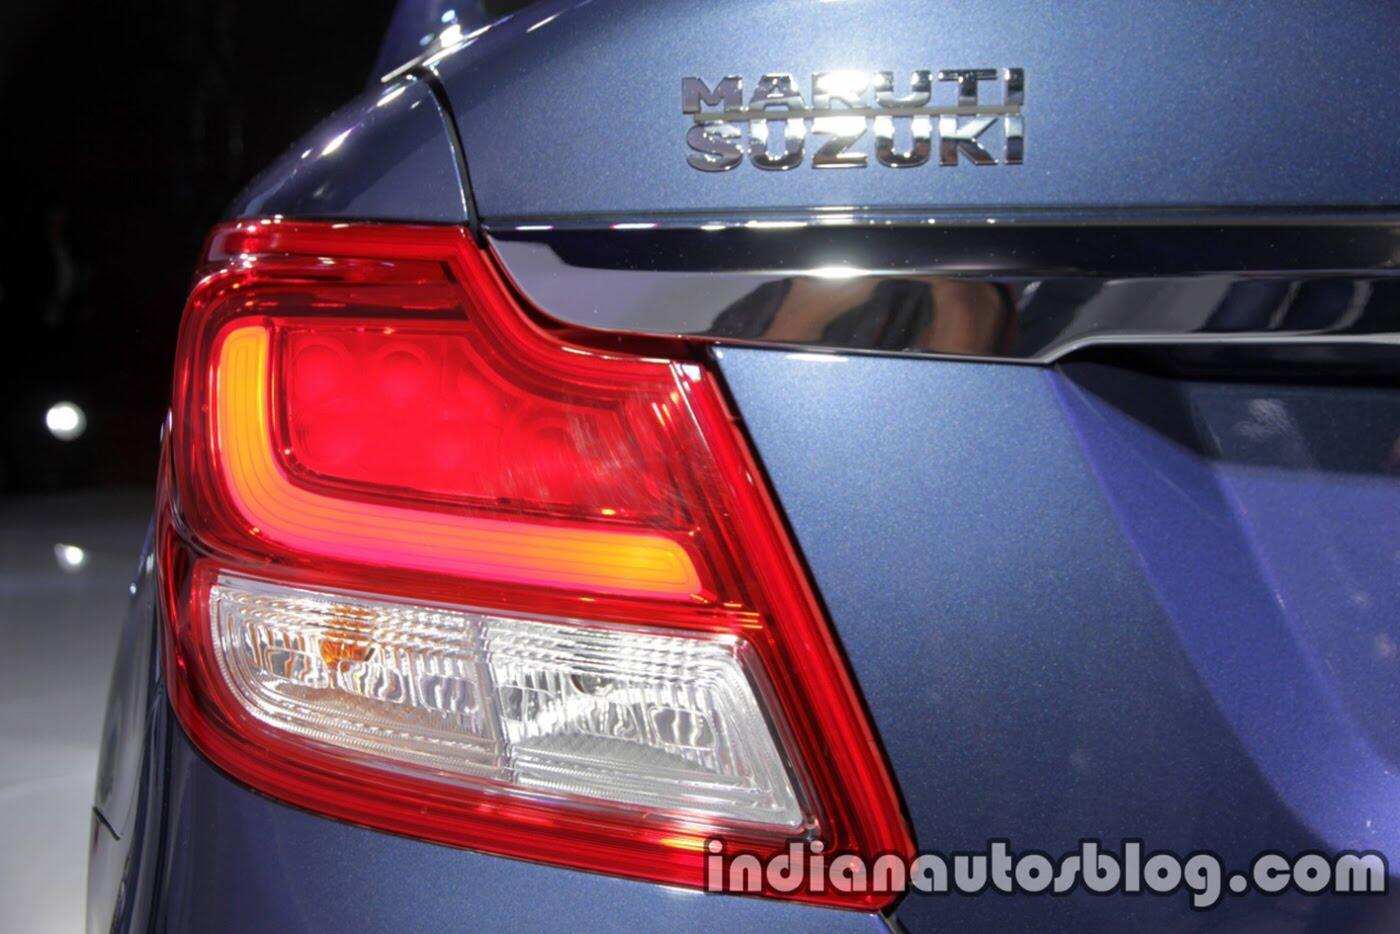 Xem thêm ảnh phiên bản sedan của Suzuki Swift 2018 - Hình 5